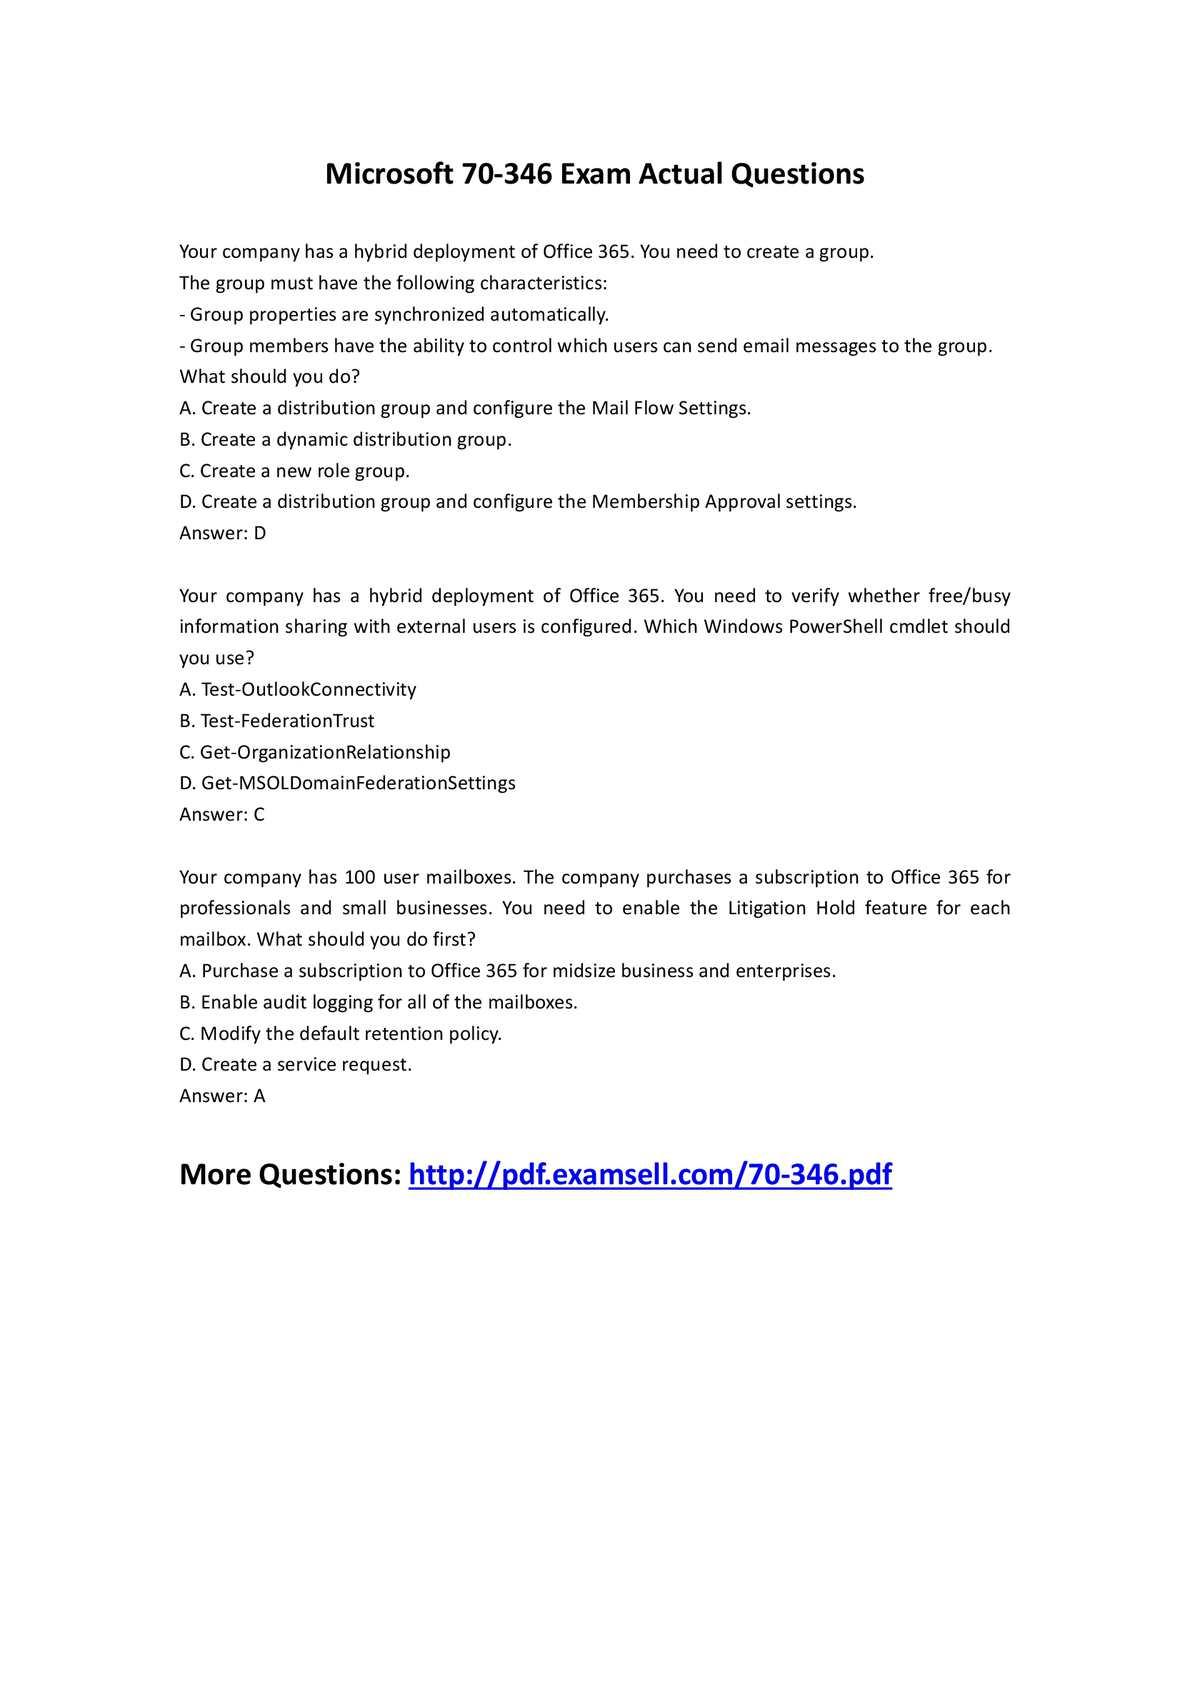 Calaméo - Actual Microsoft 70 346 Exam Test Questions